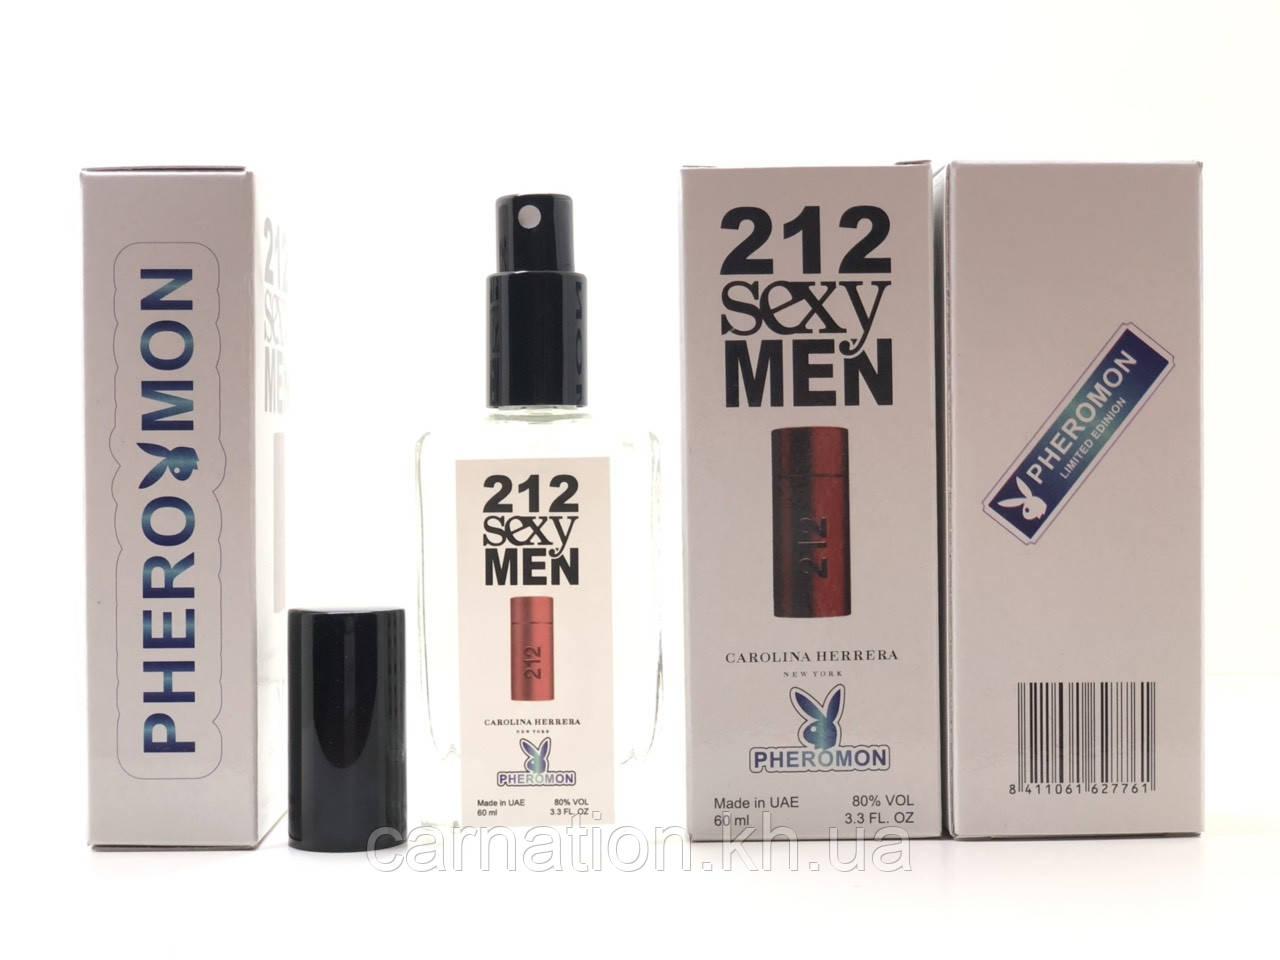 Чоловічий тестер Carolina Herrera 212 Sexy Men (212 Sexy Мен) 60 мл